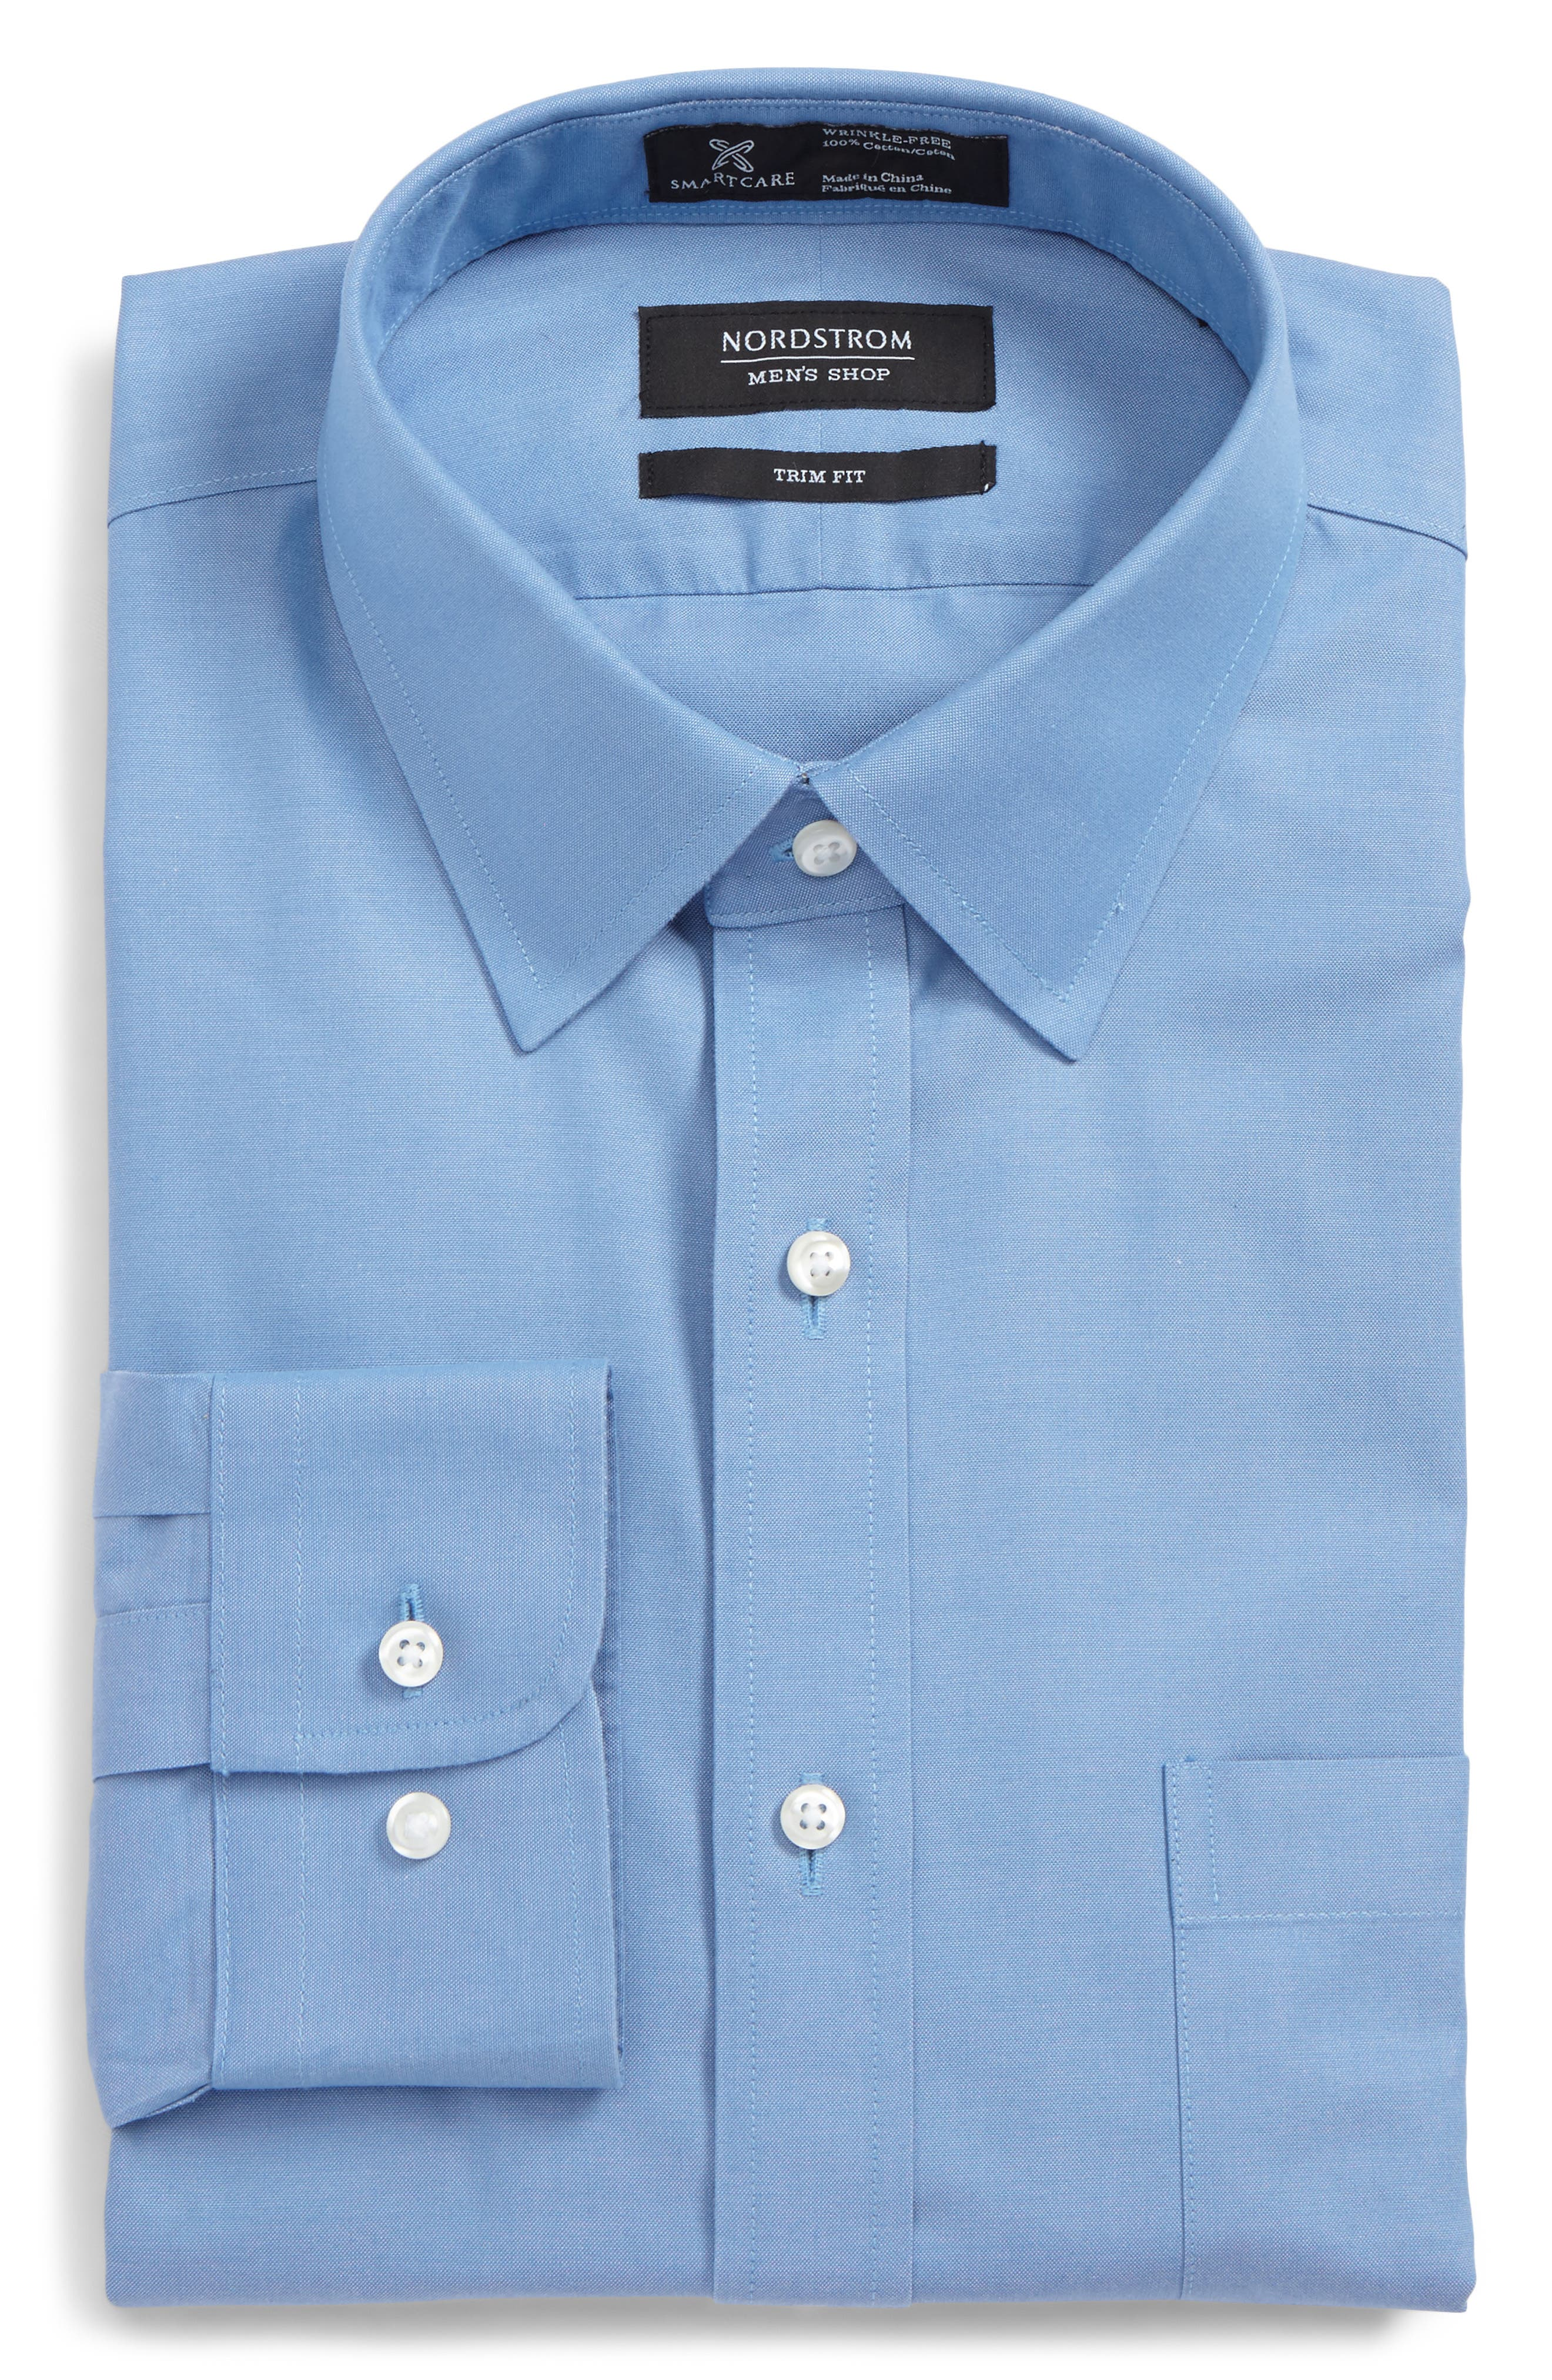 Nordstrom Shop Smartcare(TM) Trim Fit Solid Dress Shirt, 5.5 34/35 - Blue